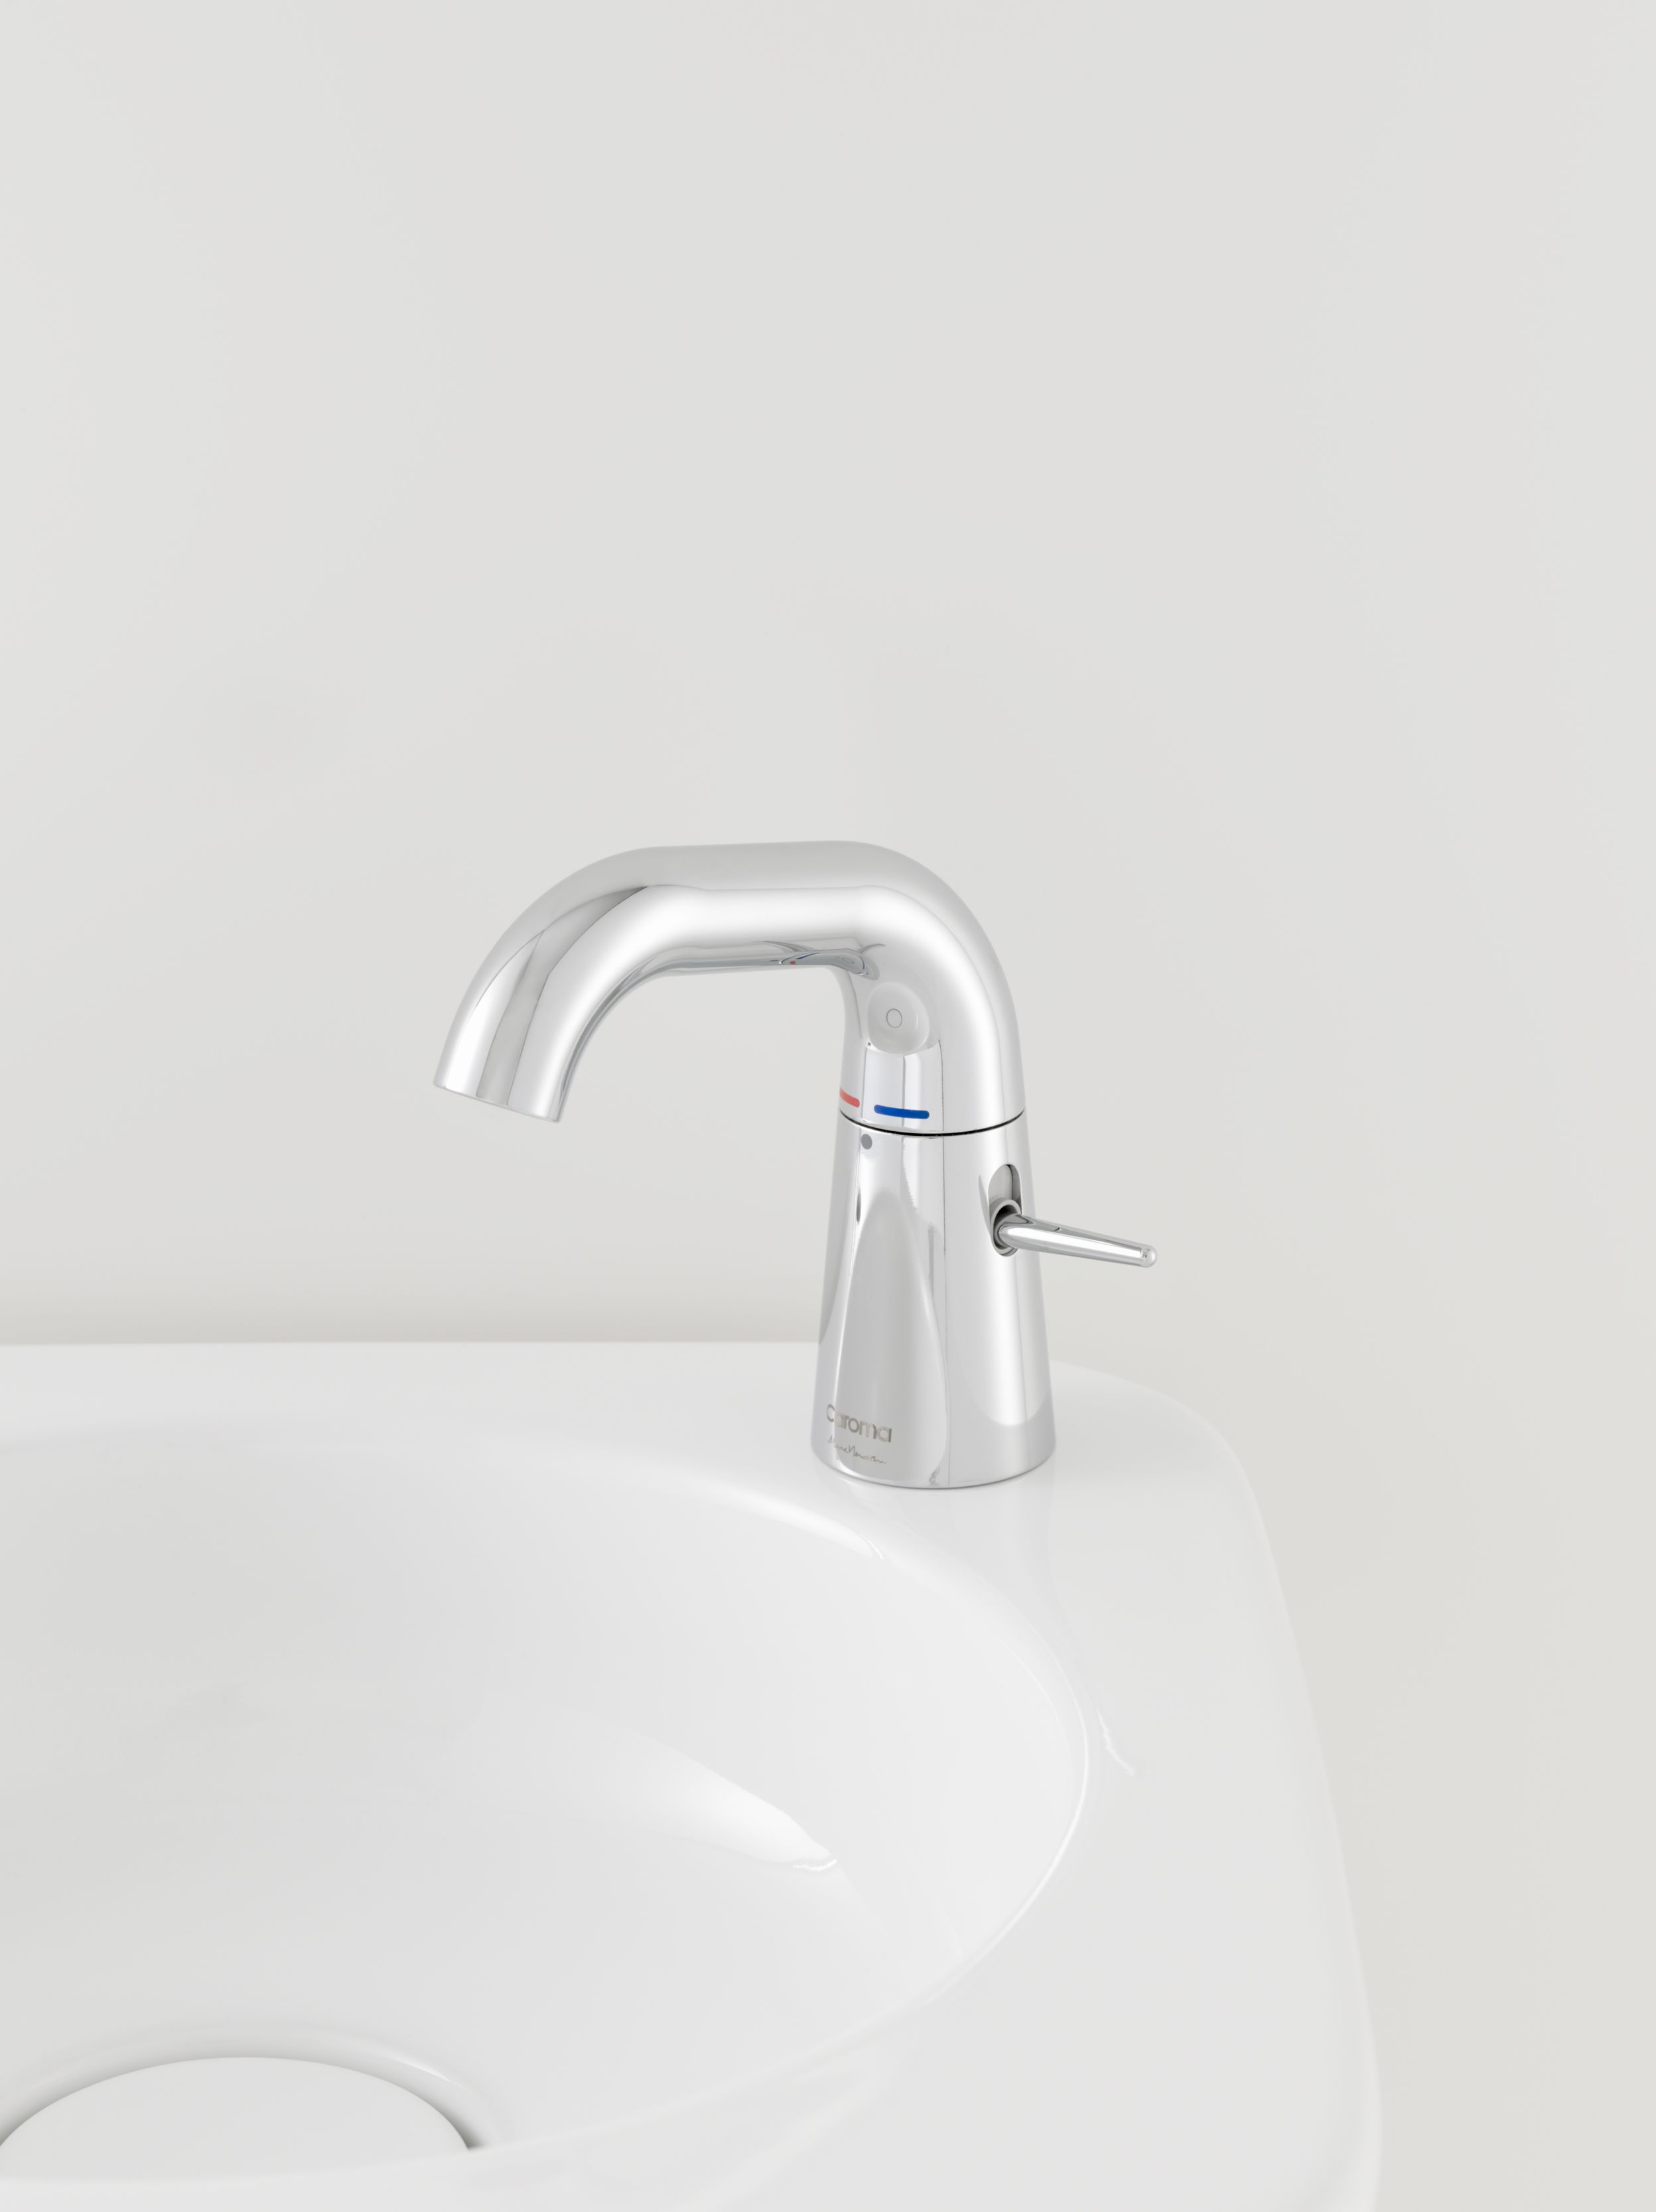 #Caroma #marc #newson #sink #bathroom Caroma & Marc Newson